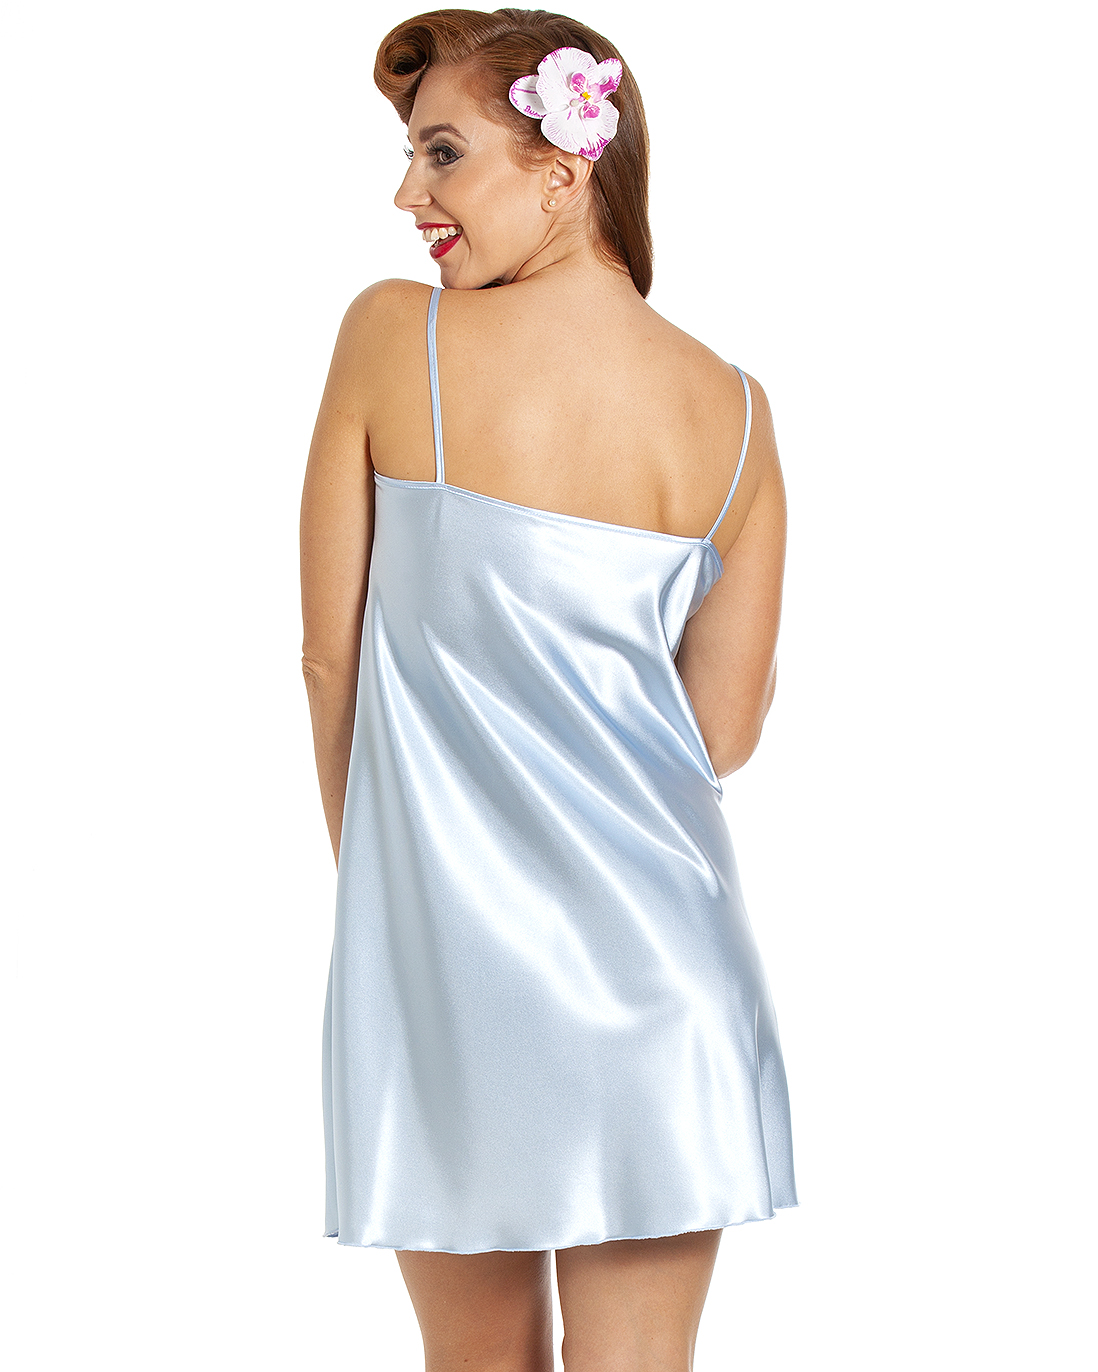 05afeae7cdeb Jane Lace Trim Satin Short Nightdress – Arcadian Blue